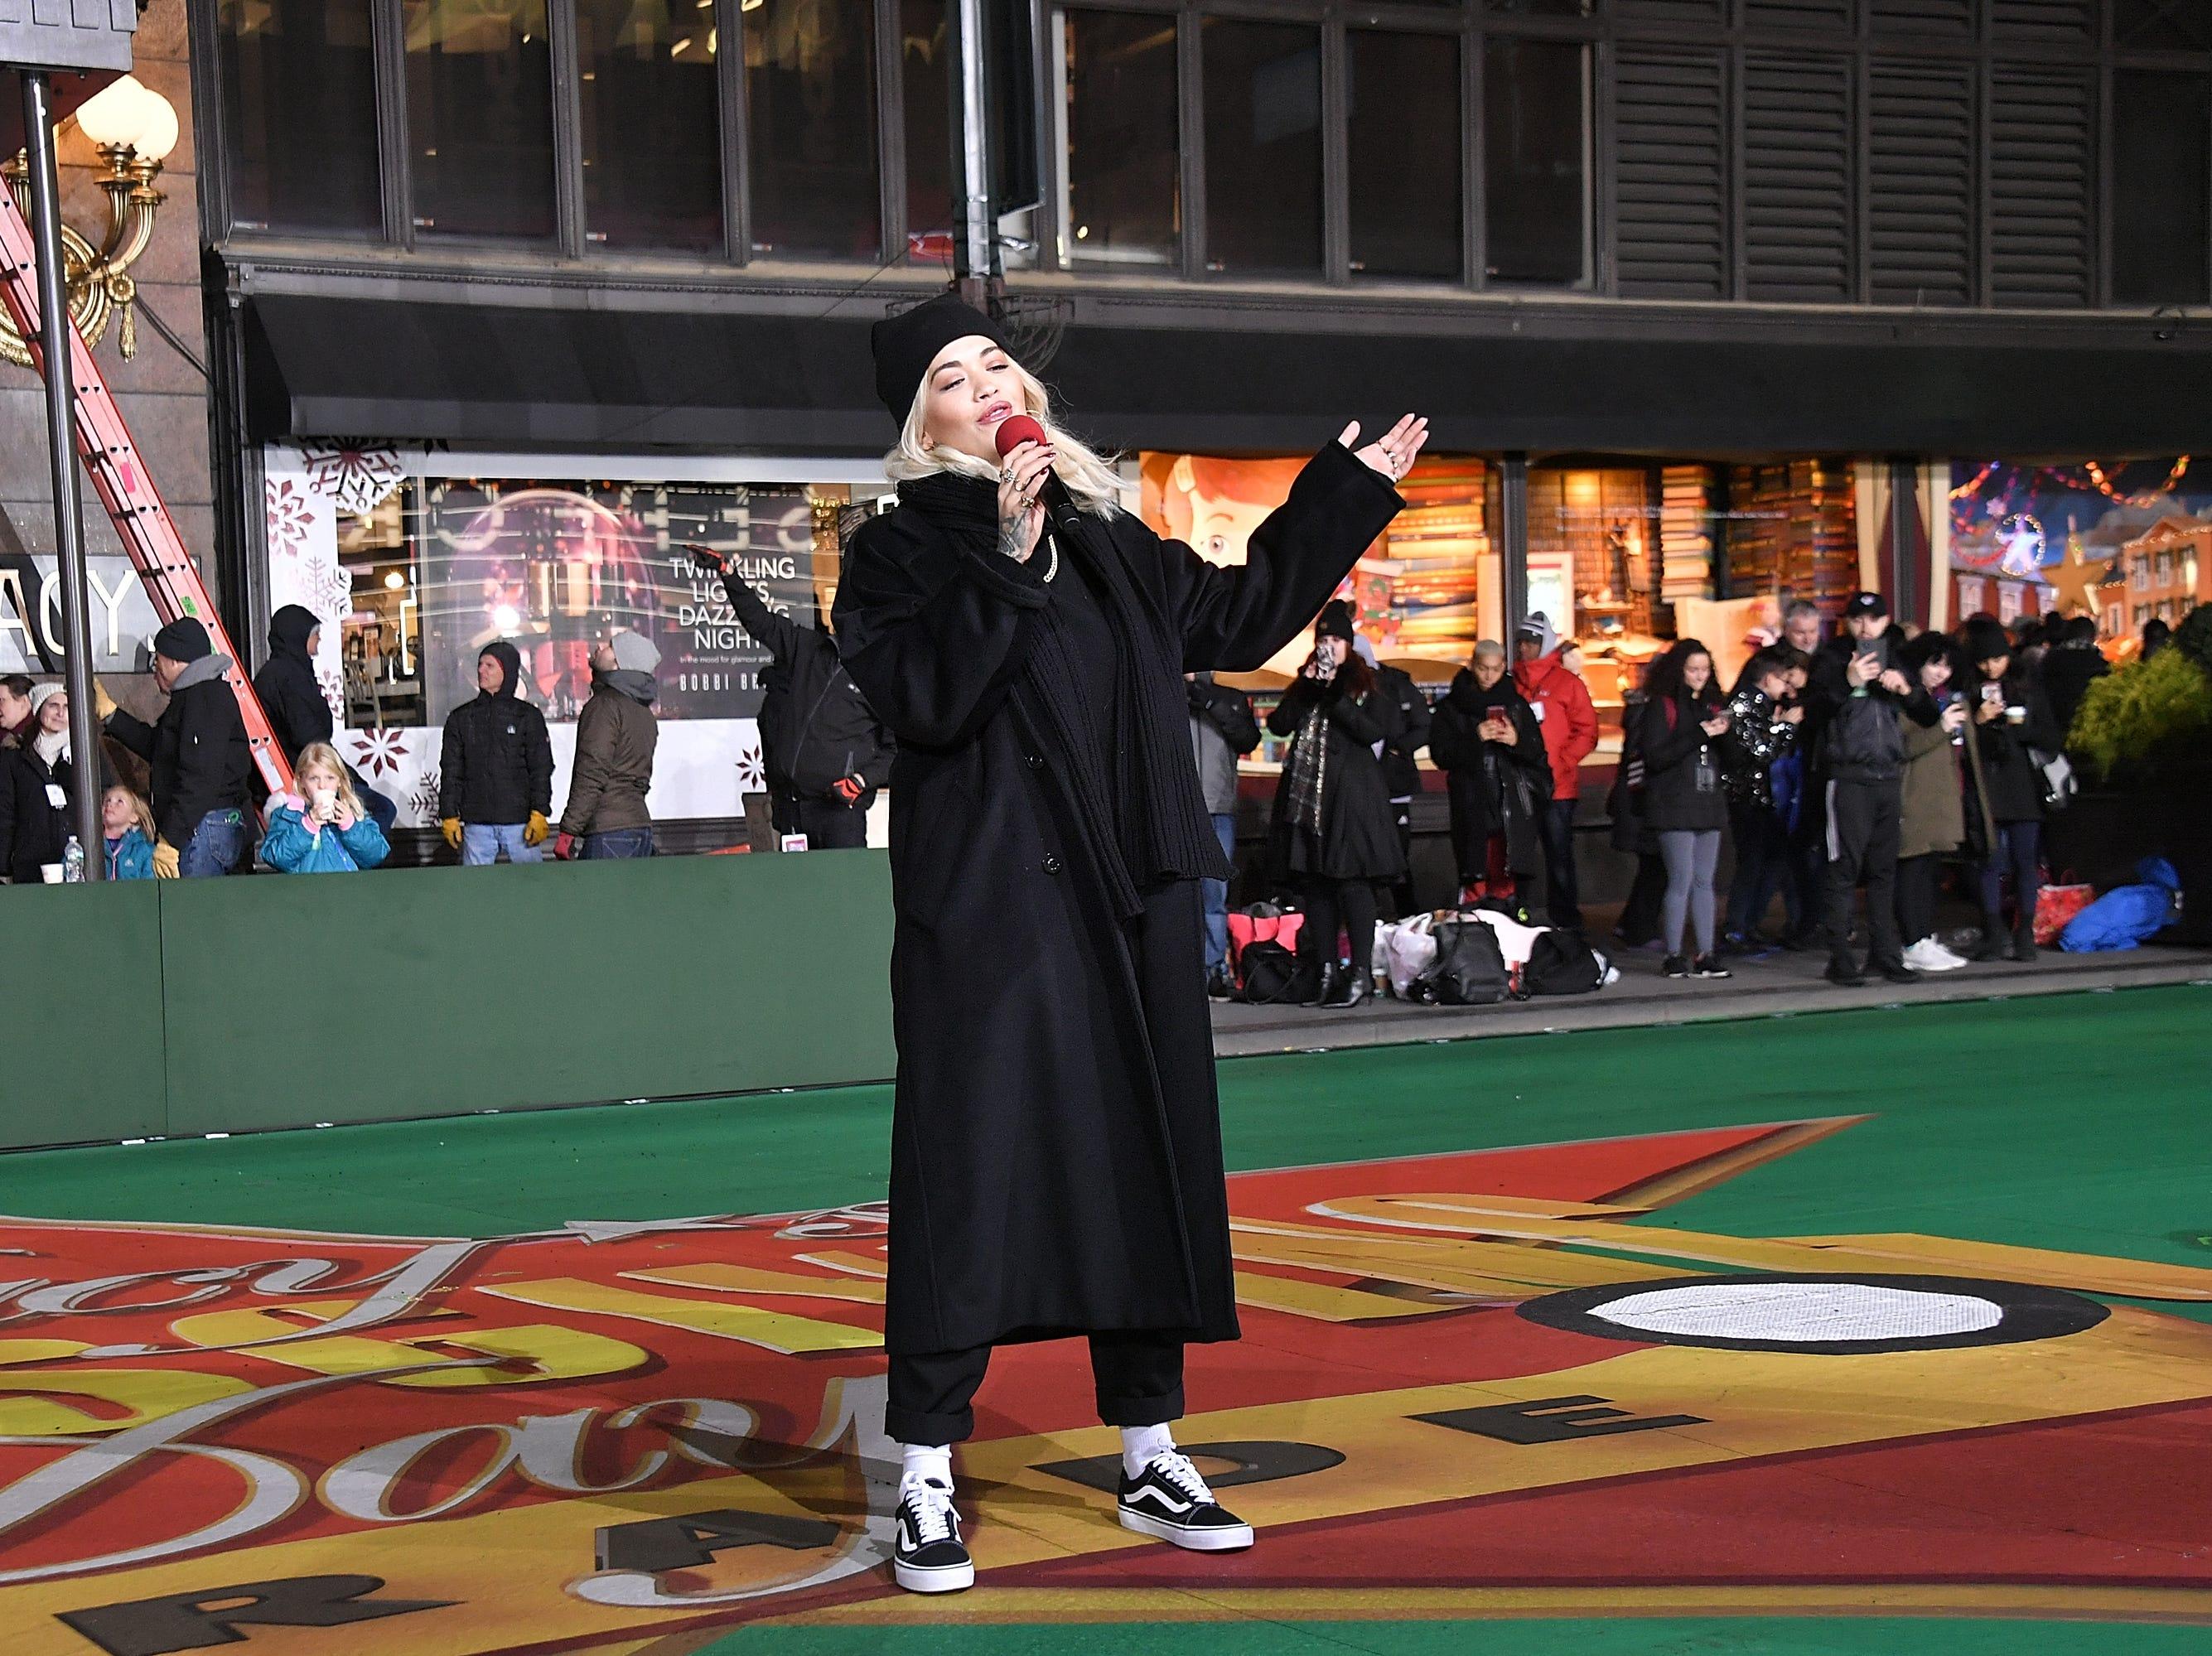 November 20: Rita Ora rehearses for the Macy's Thanksgiving Day Parade.